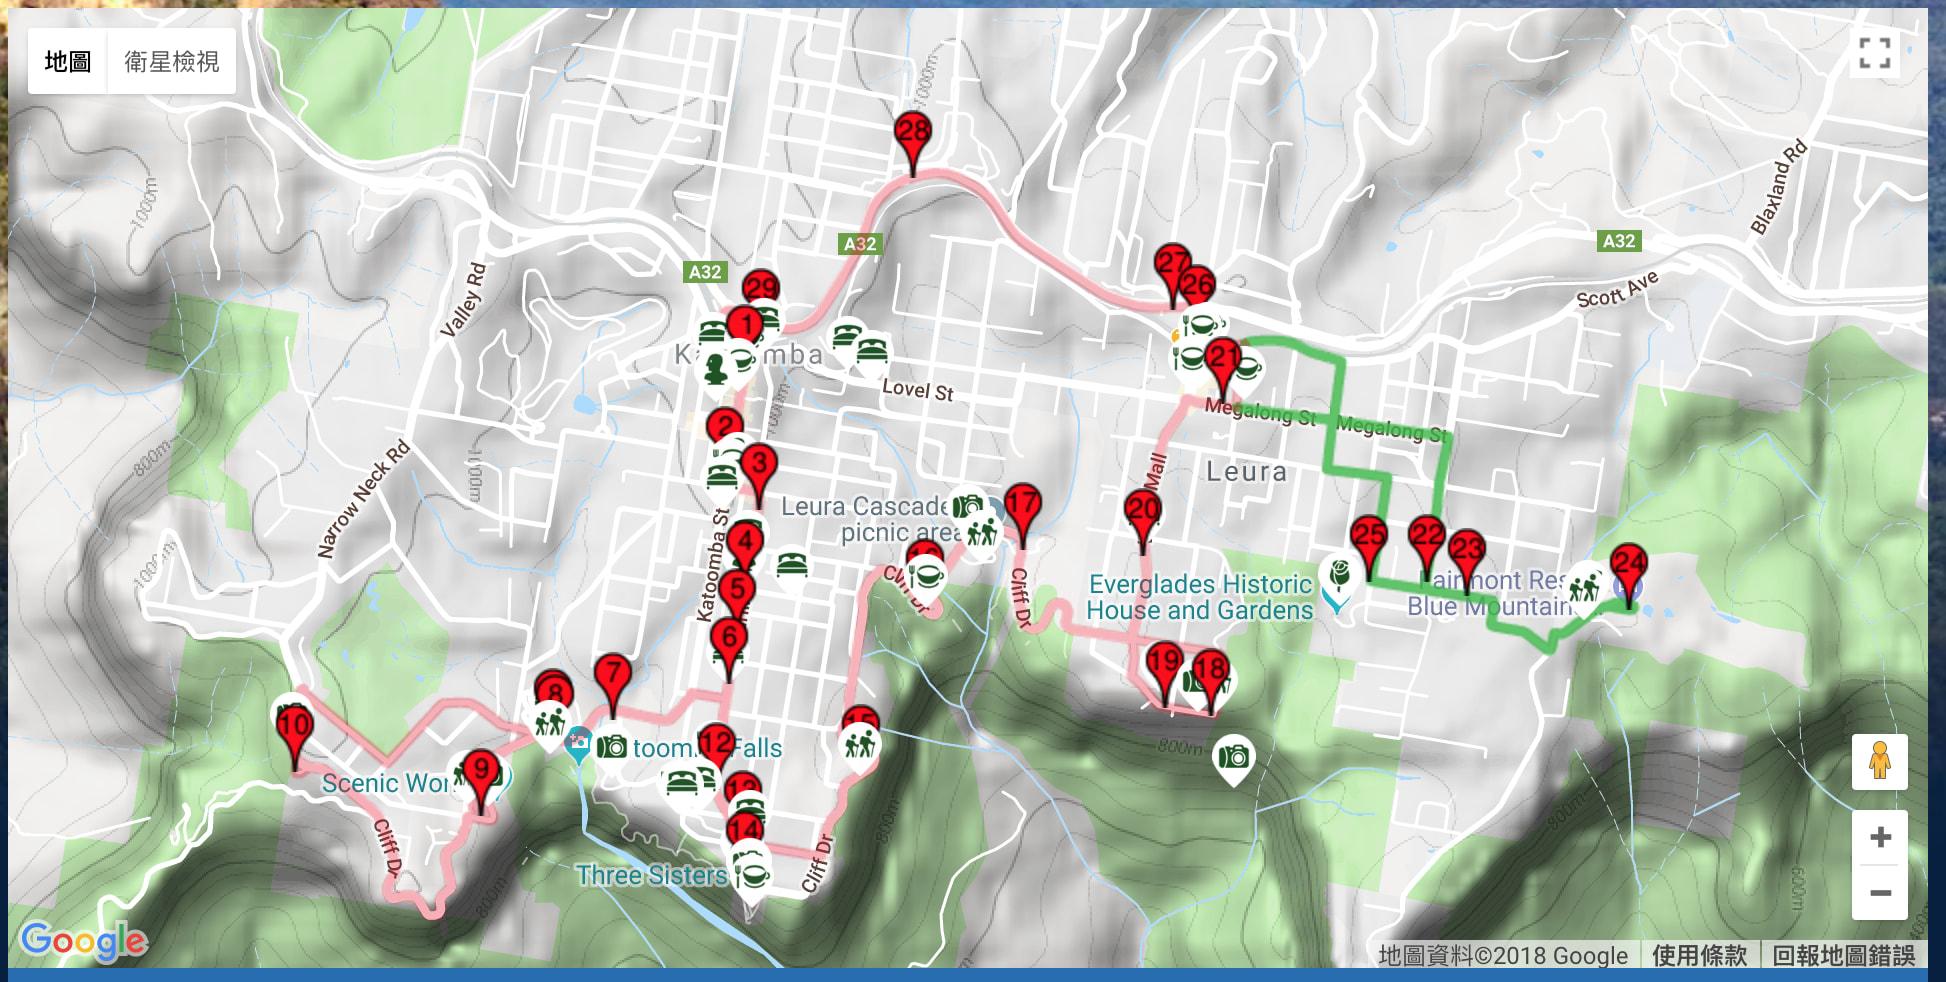 Blue Mountain Explore Bus 路線圖 http://www.explorerbus.com.au/map.html